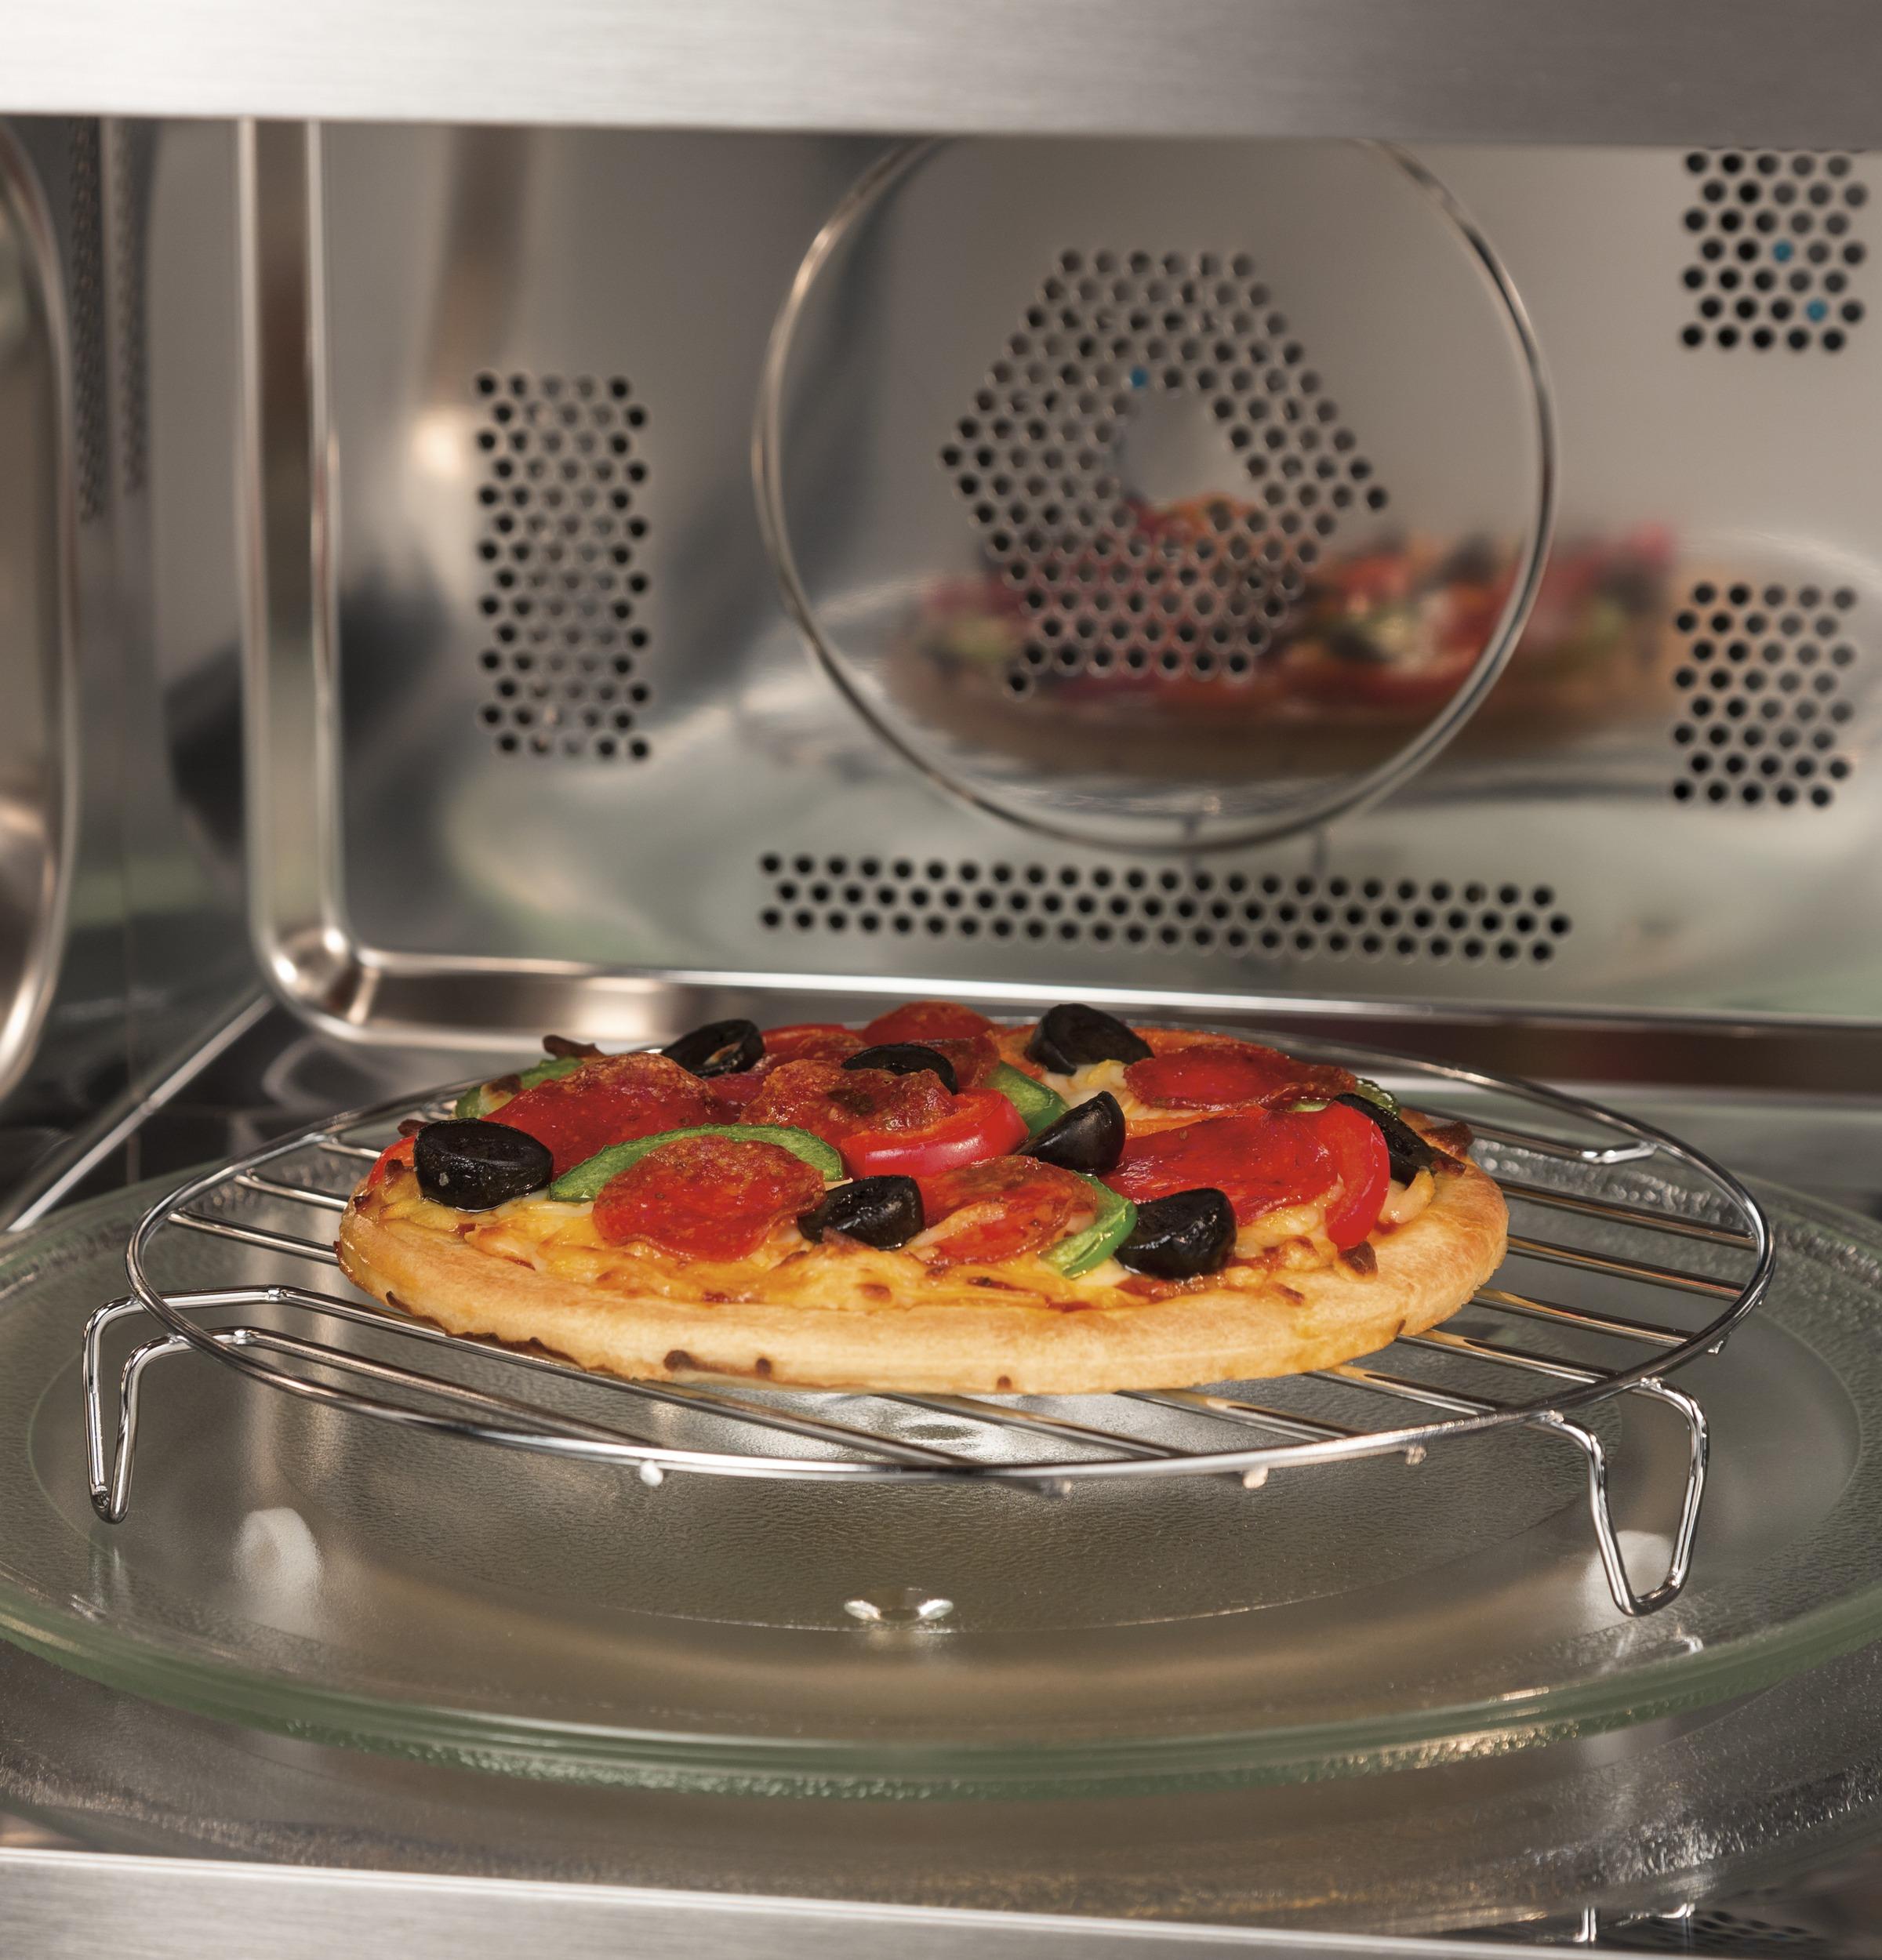 Model: PEB9159DJBB | GE Profile™ Series 1.5 Cu. Ft. Countertop Convection/Microwave Oven